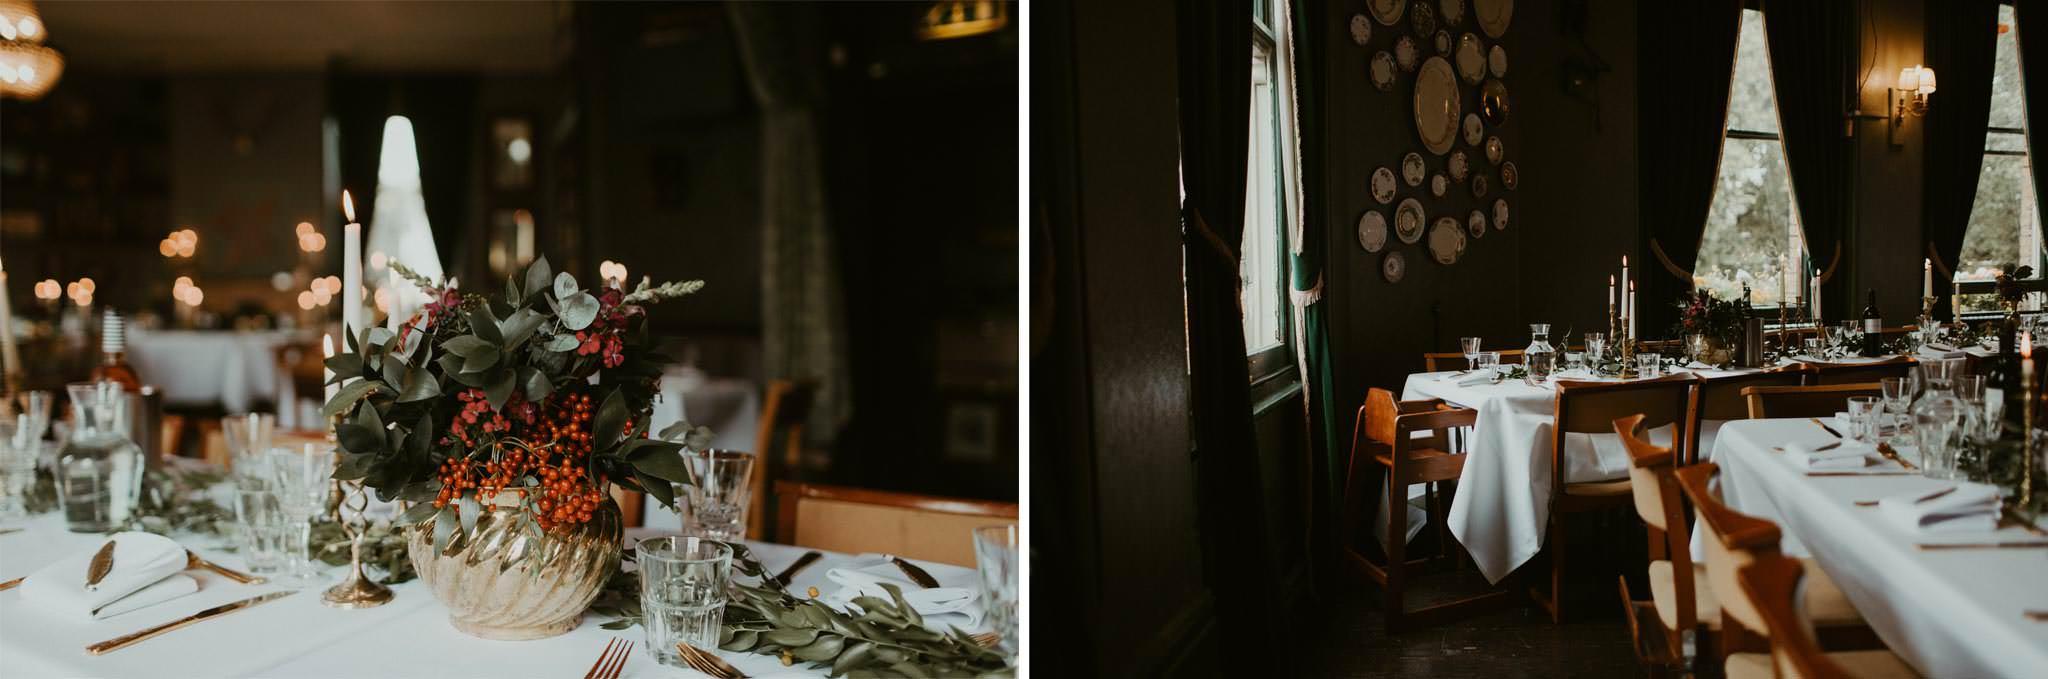 destination-wedding-photographer-135